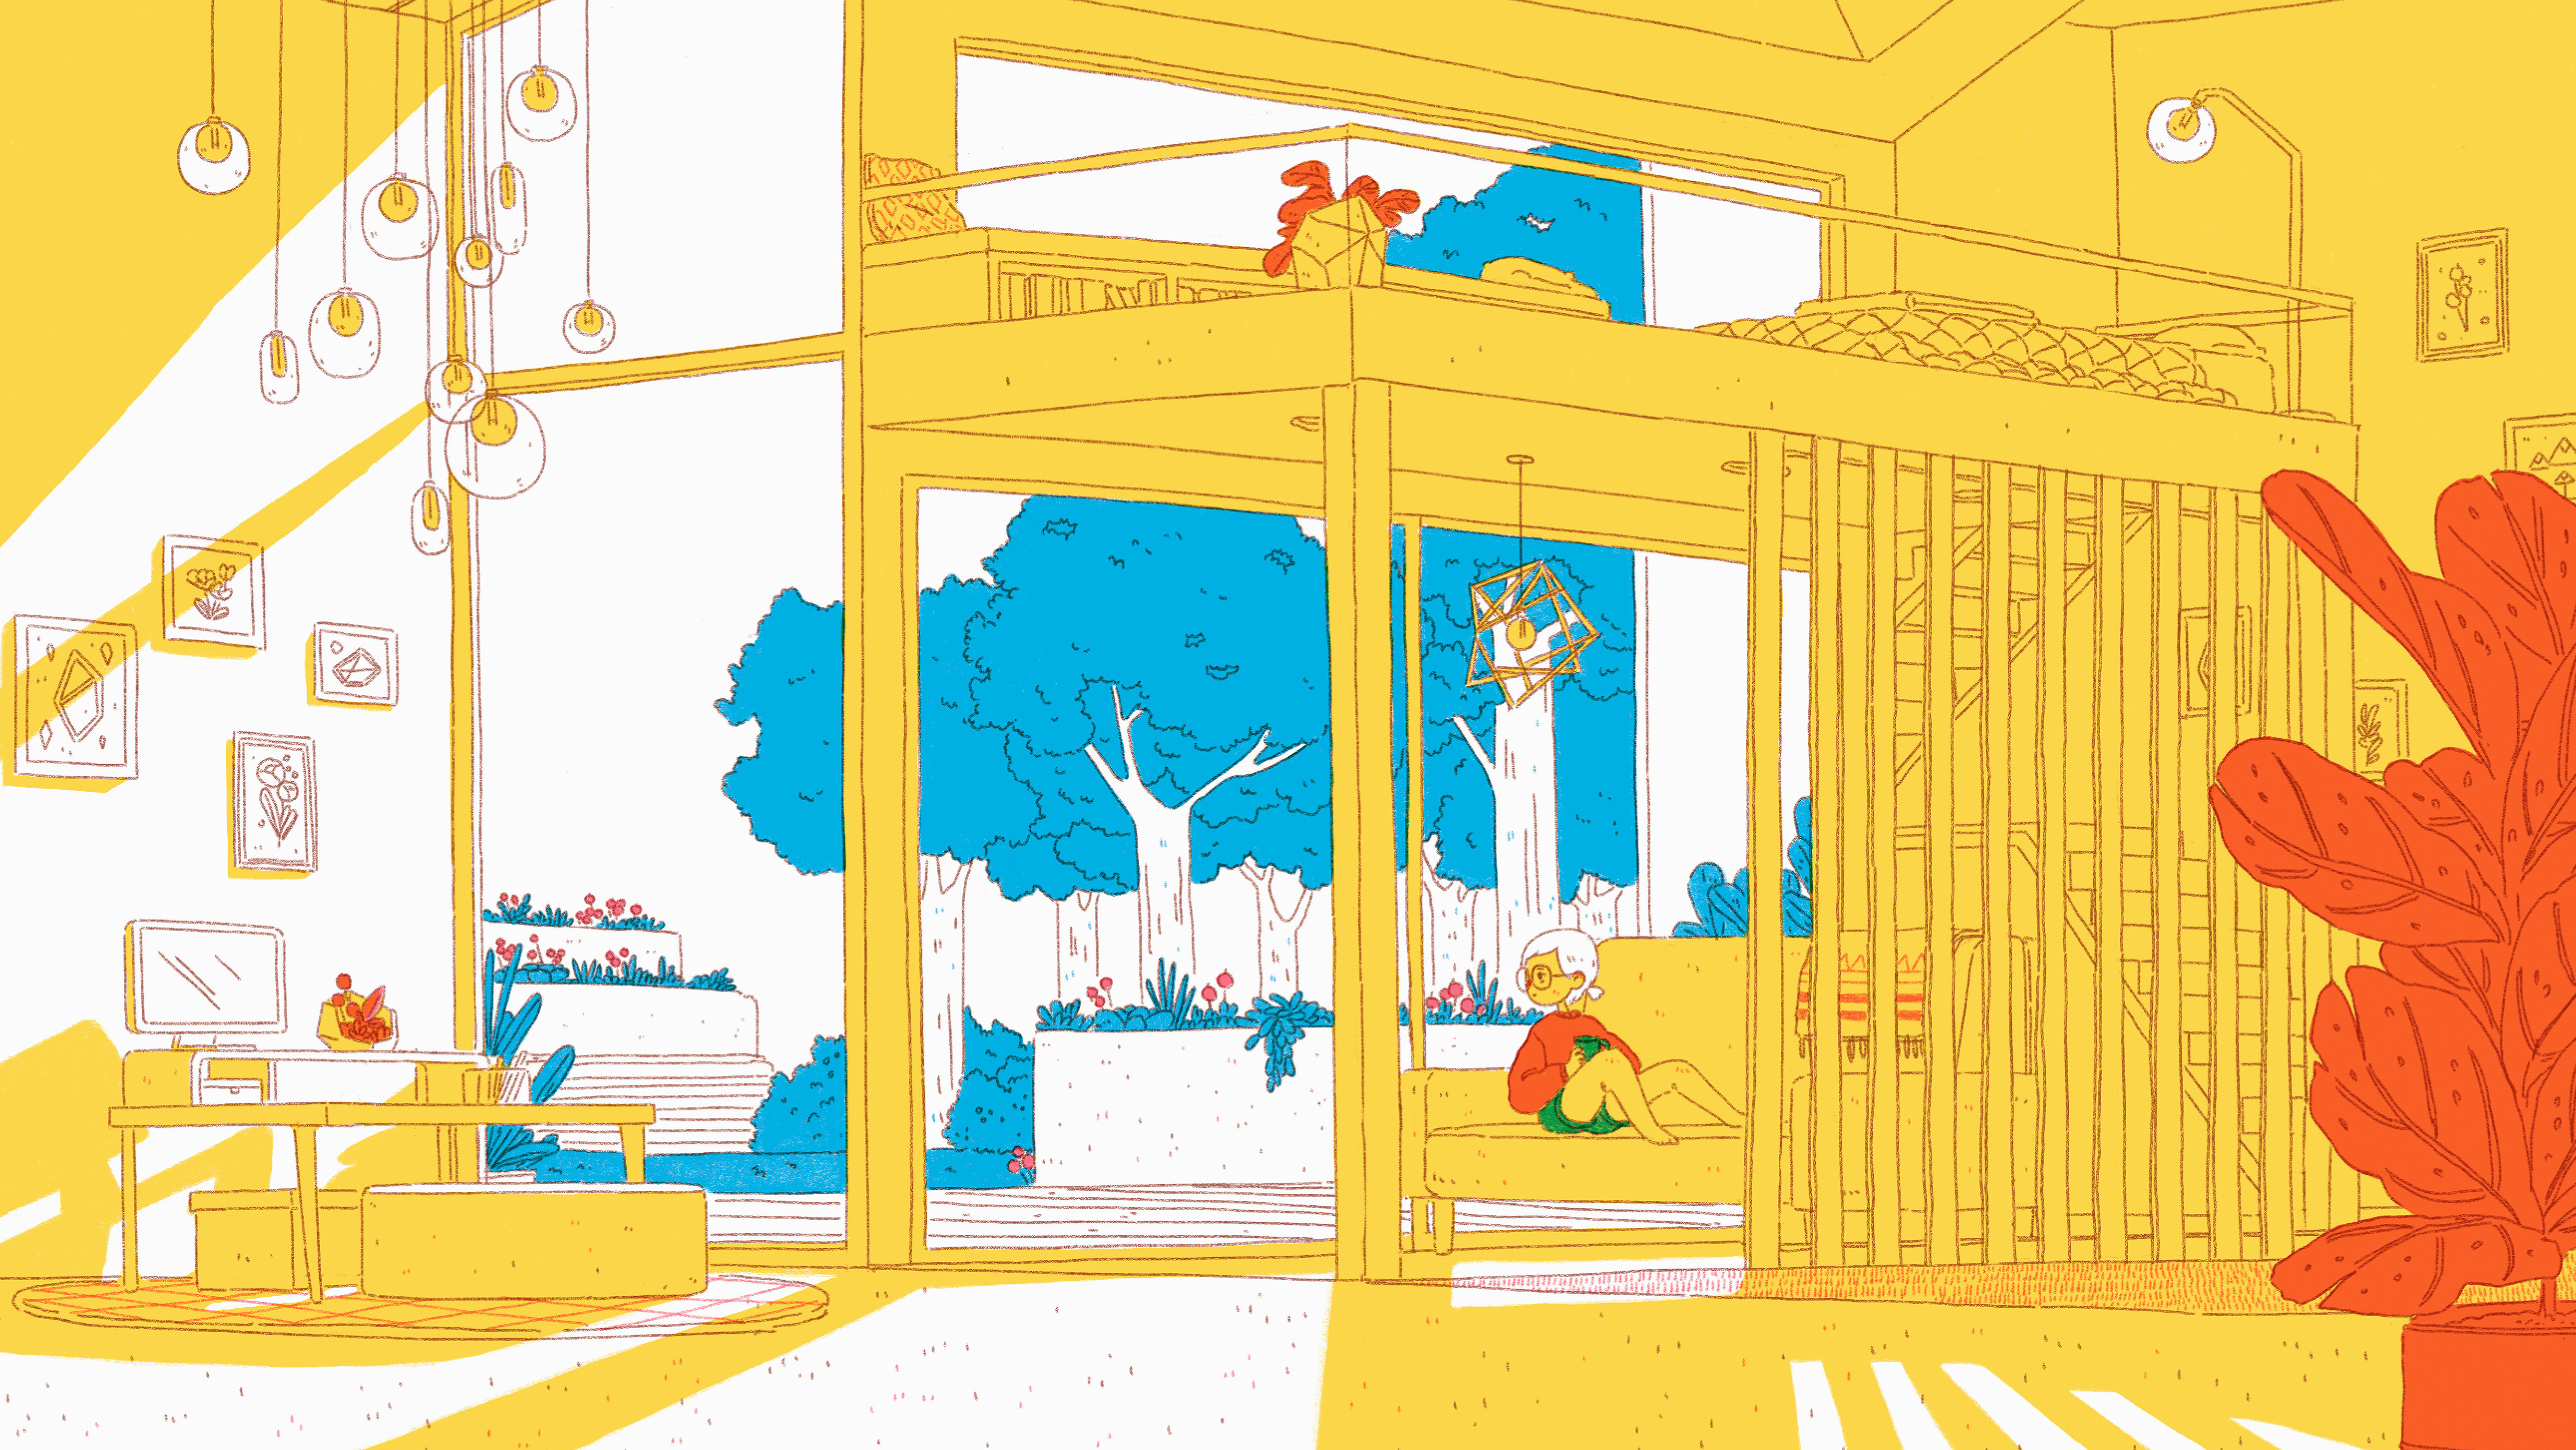 Illustration by Sarah Soh